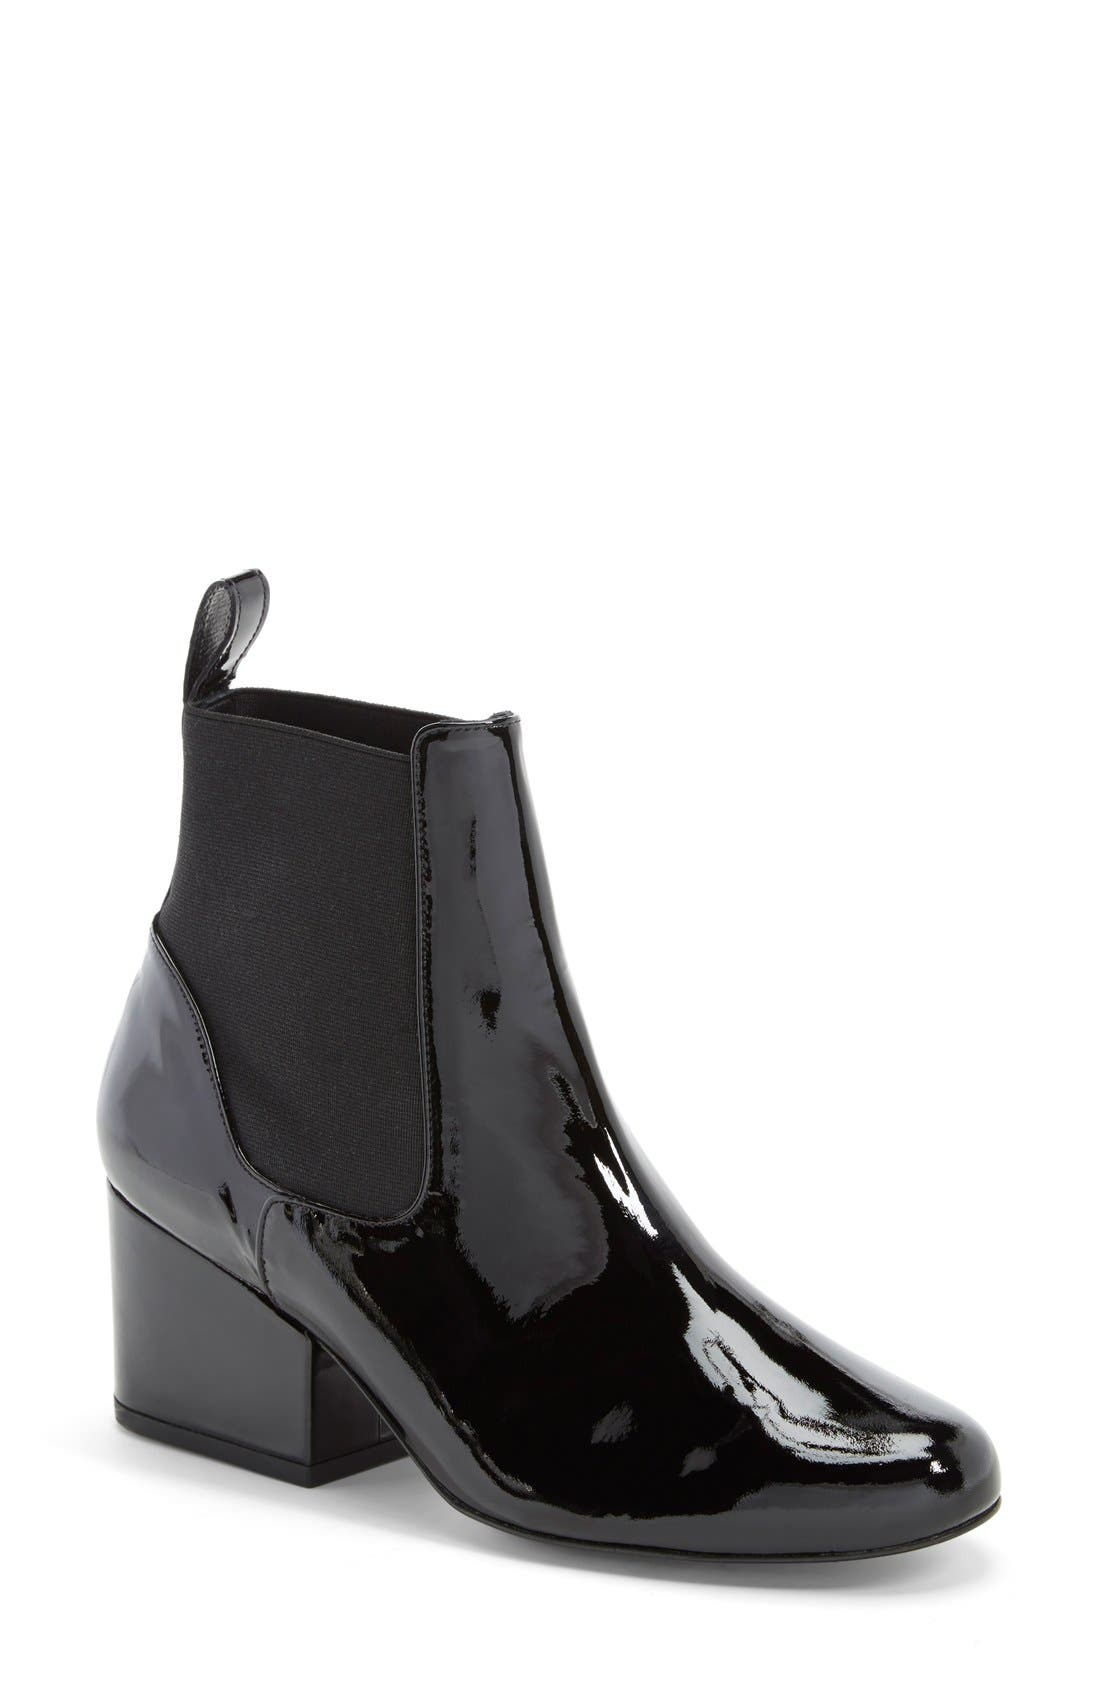 Alternate Image 1 Selected - Robert Clergerie 'Moon' Chelsea Boot (Women)